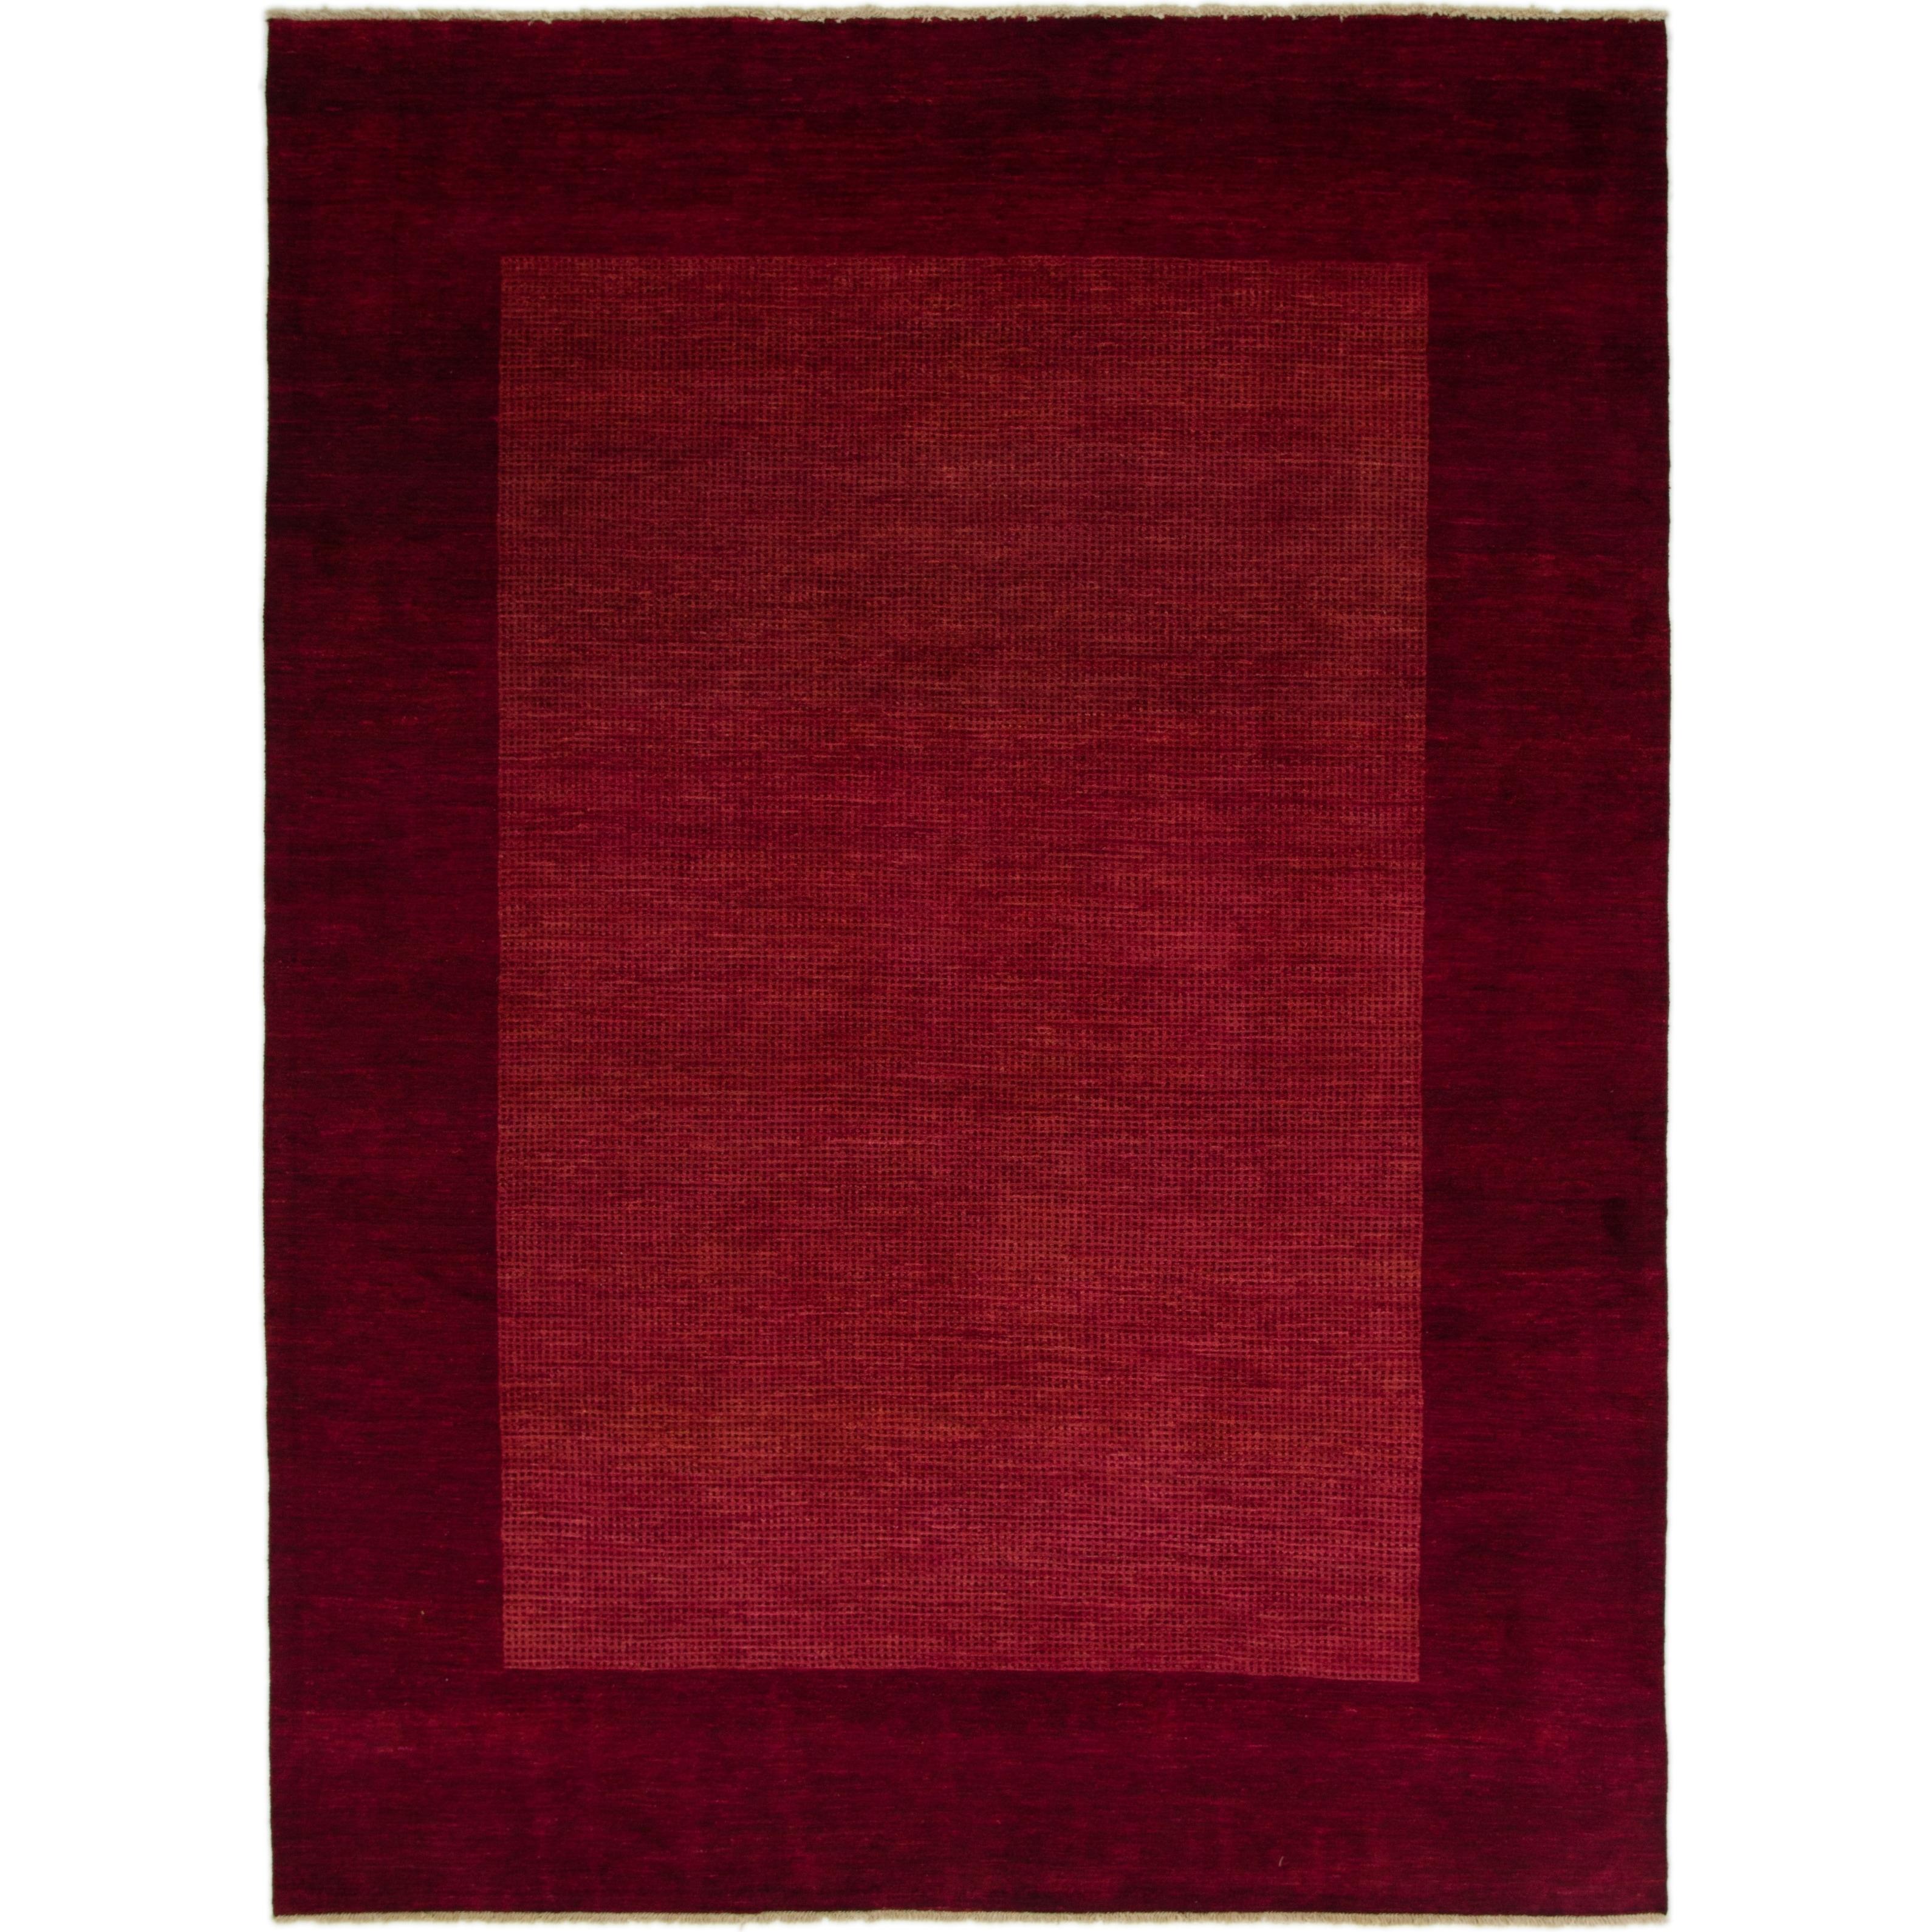 Hand Knotted Kashkuli Gabbeh Wool Area Rug - 8 2 x 11 (Burgundy - 8 2 x 11)